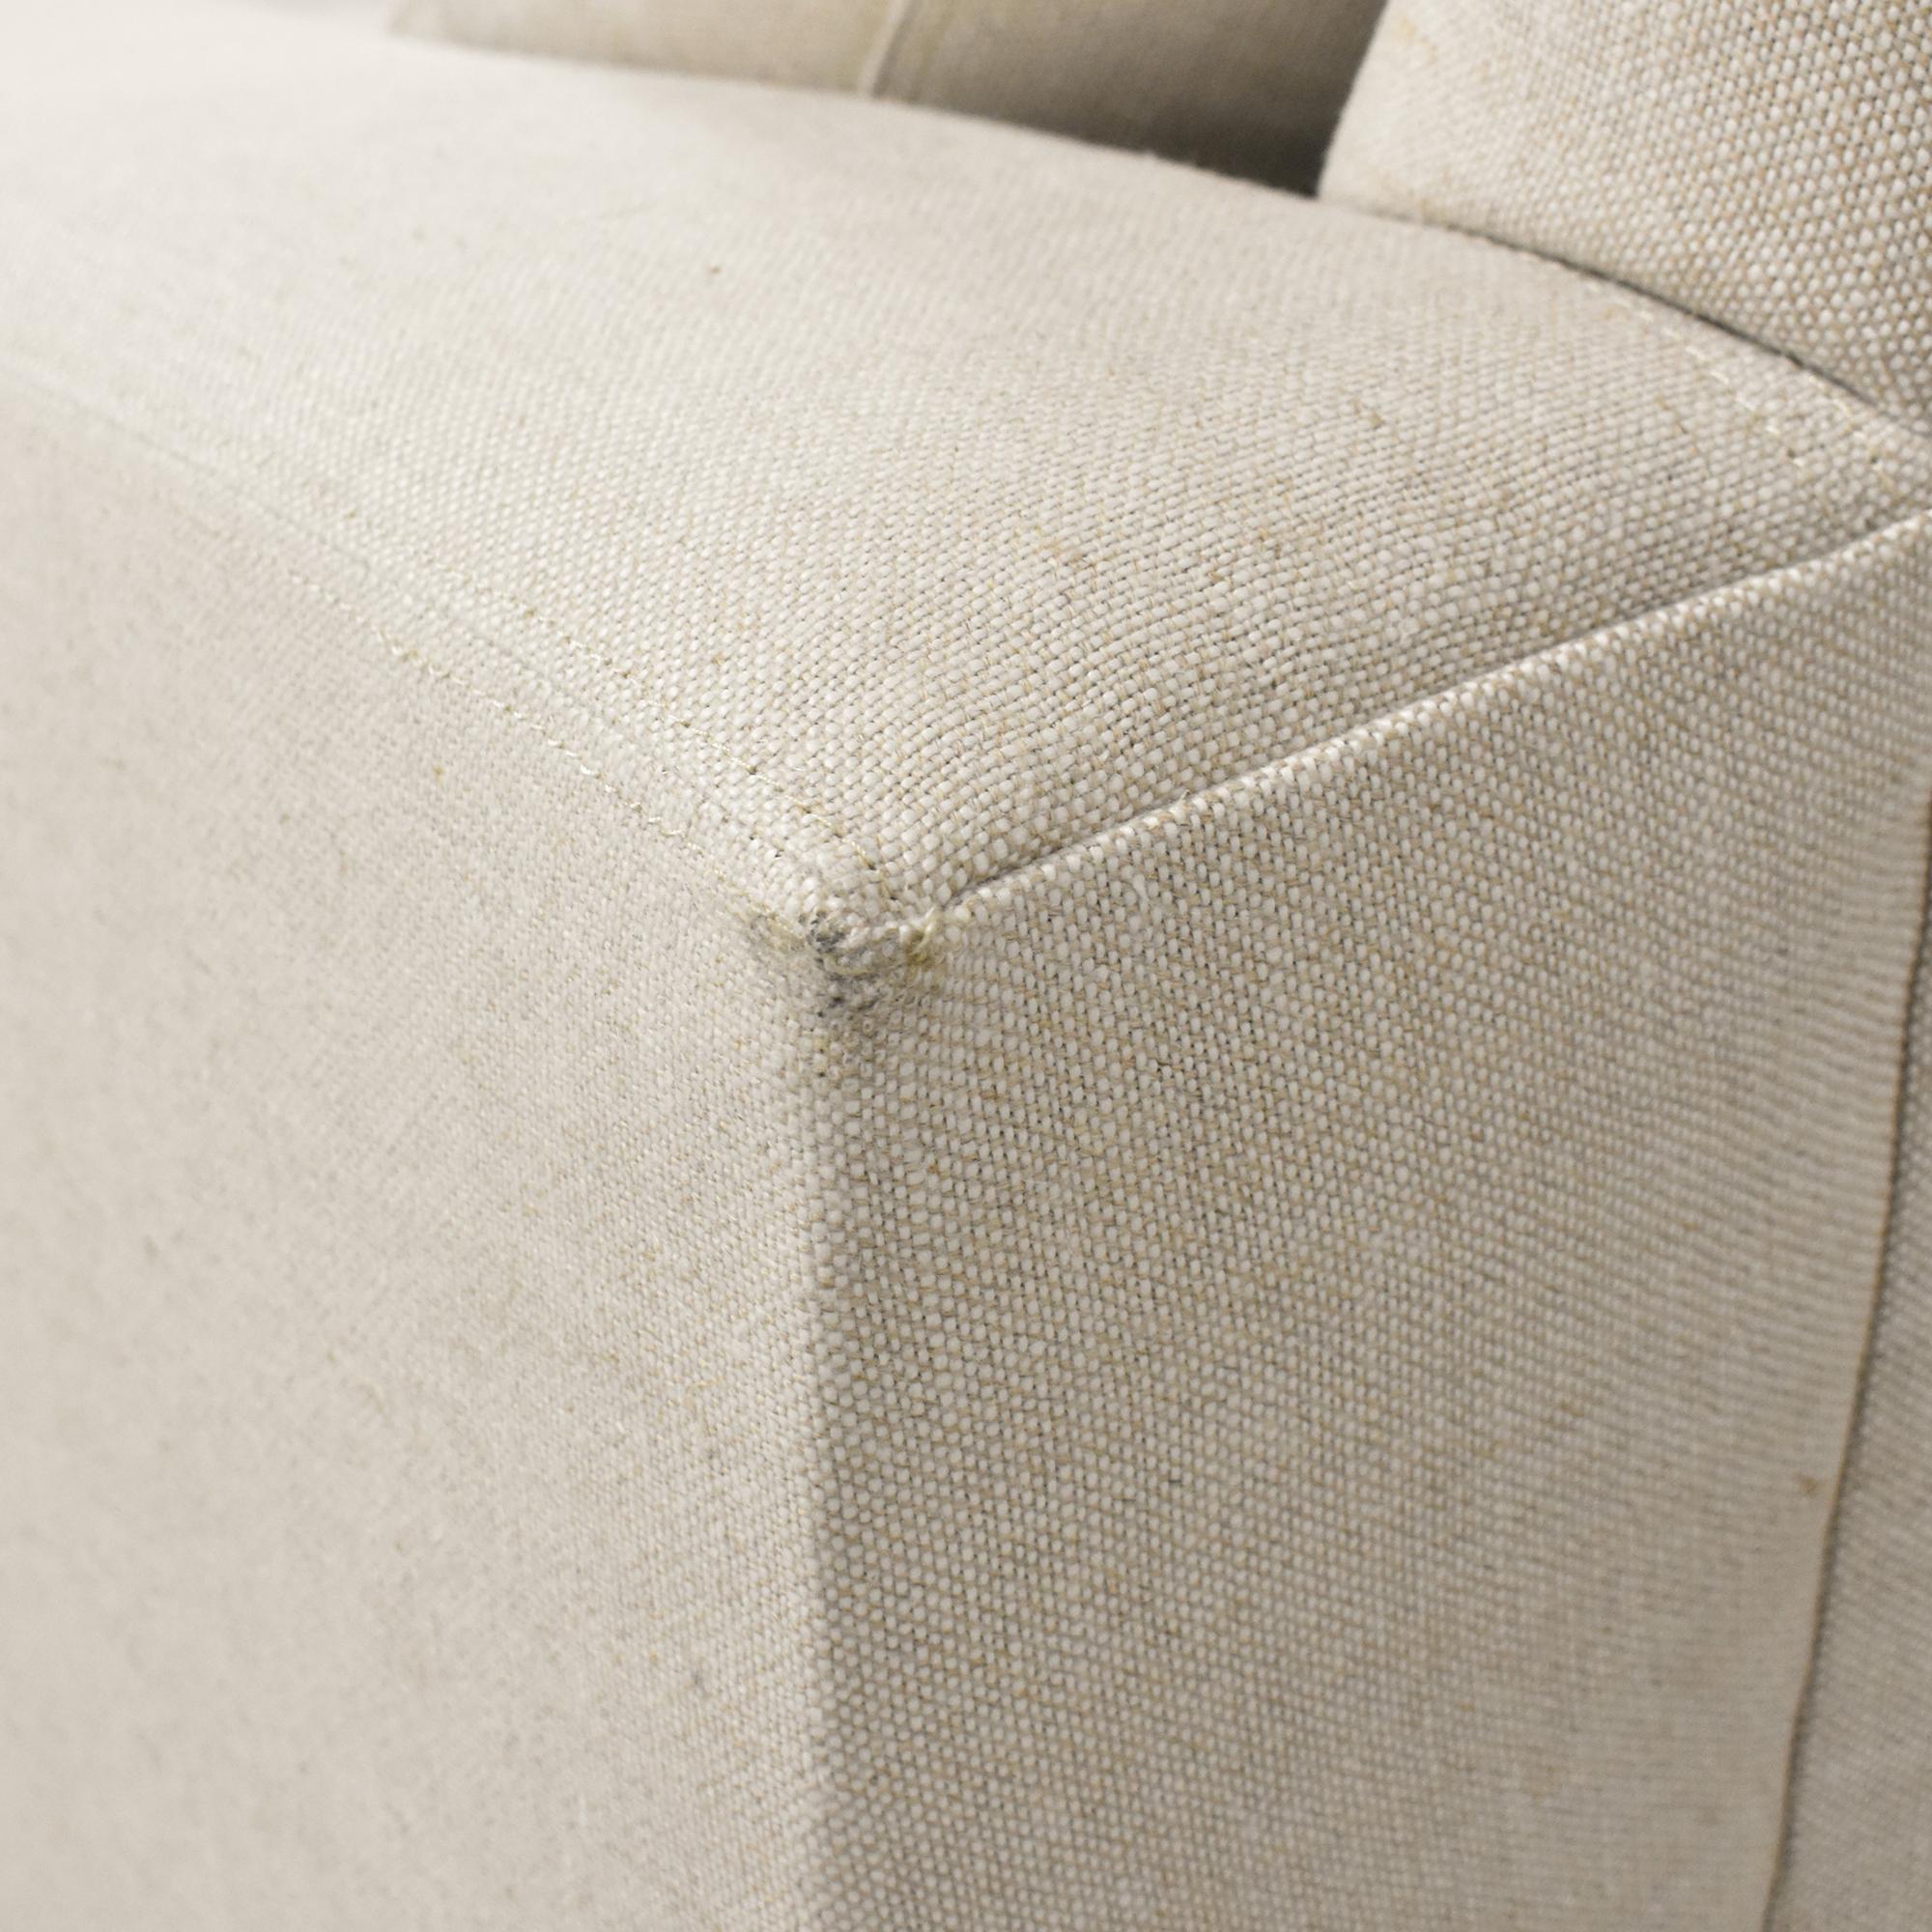 Restoration Hardware Restoration Hardware Two Cushion Sofa nyc